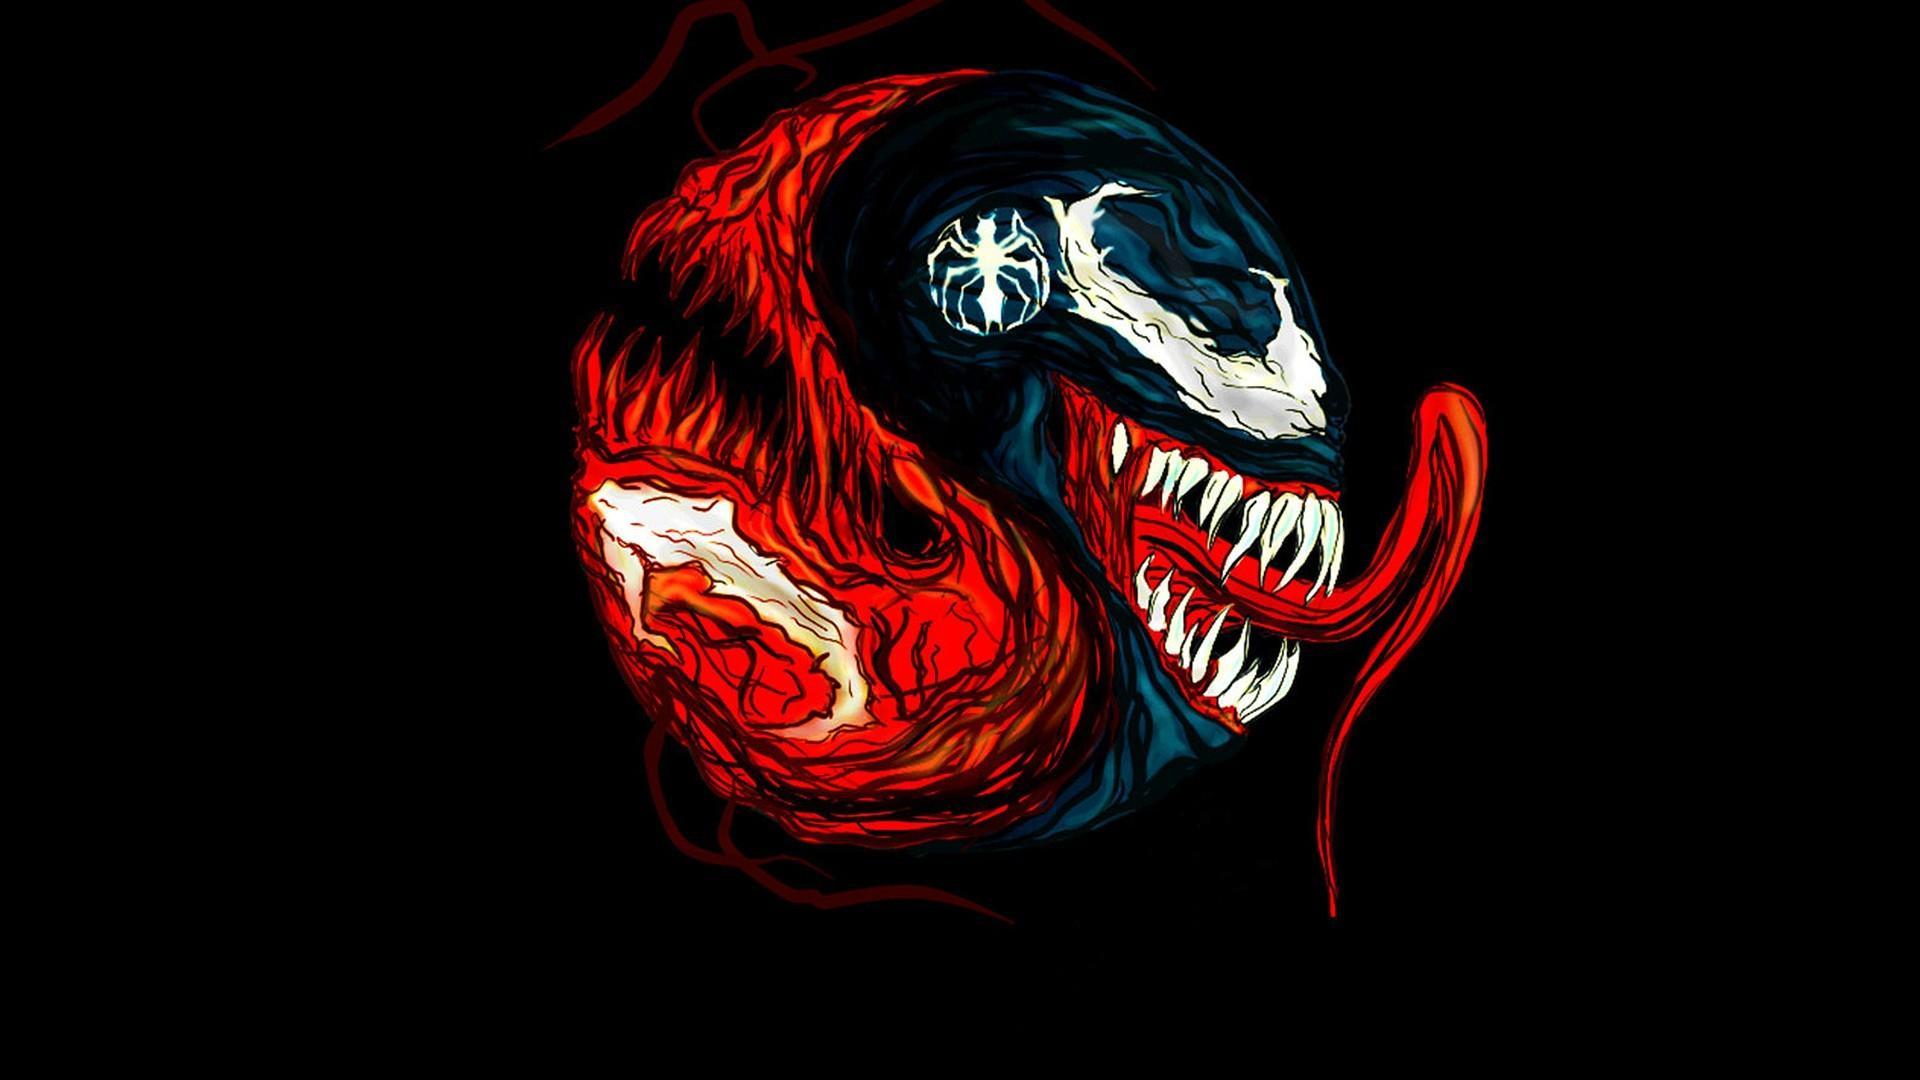 Free Download Marvel Comics Venom Black Background Fan Art Wallpaper 73018 1920x1080 For Your Desktop Mobile Tablet Explore 49 Venom Wallpaper Hd Venom Snake Wallpaper Carnage Wallpaper Hd Venom And Carnage Wallpaper